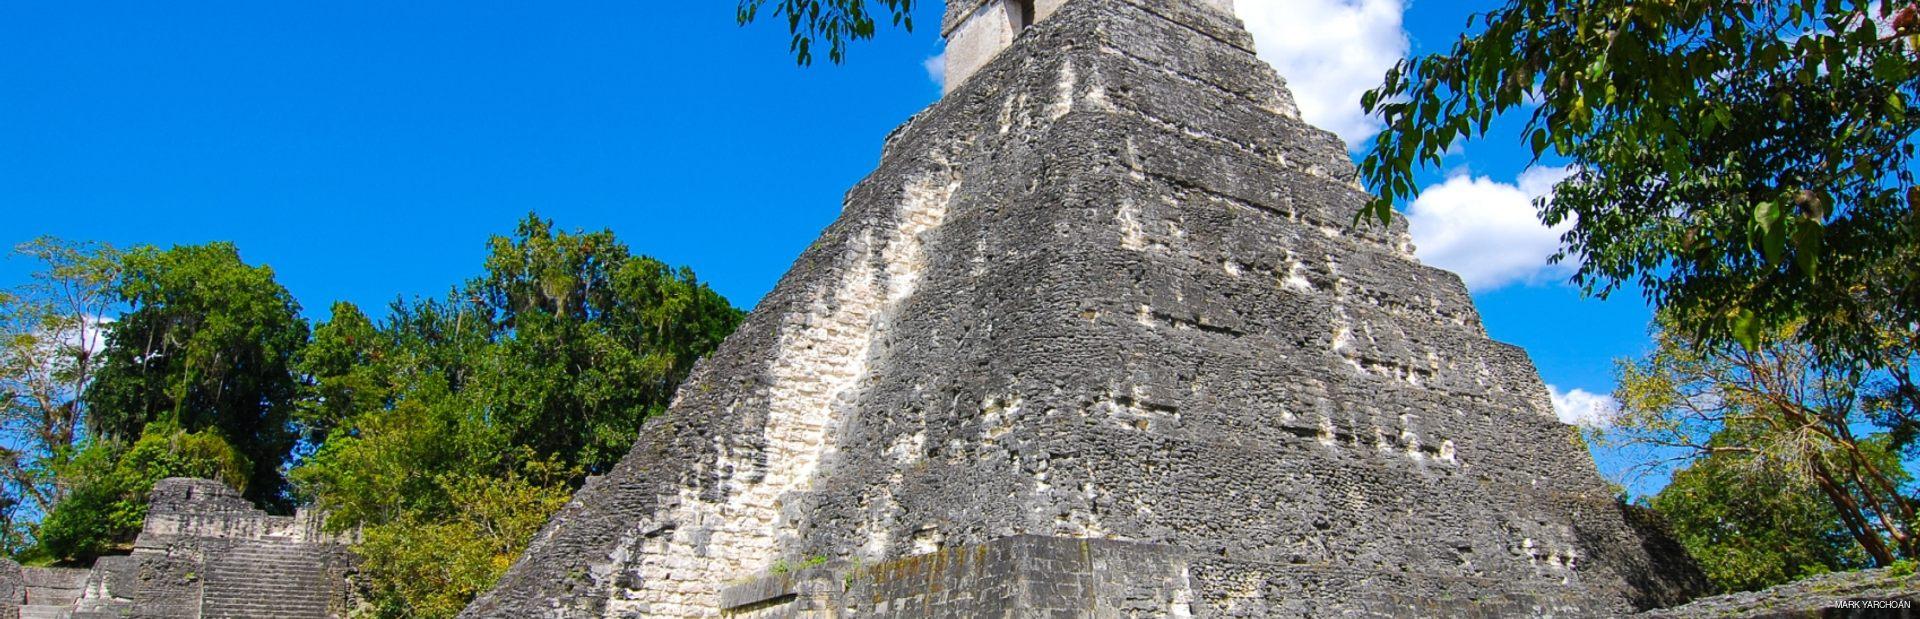 Archeological rocky building